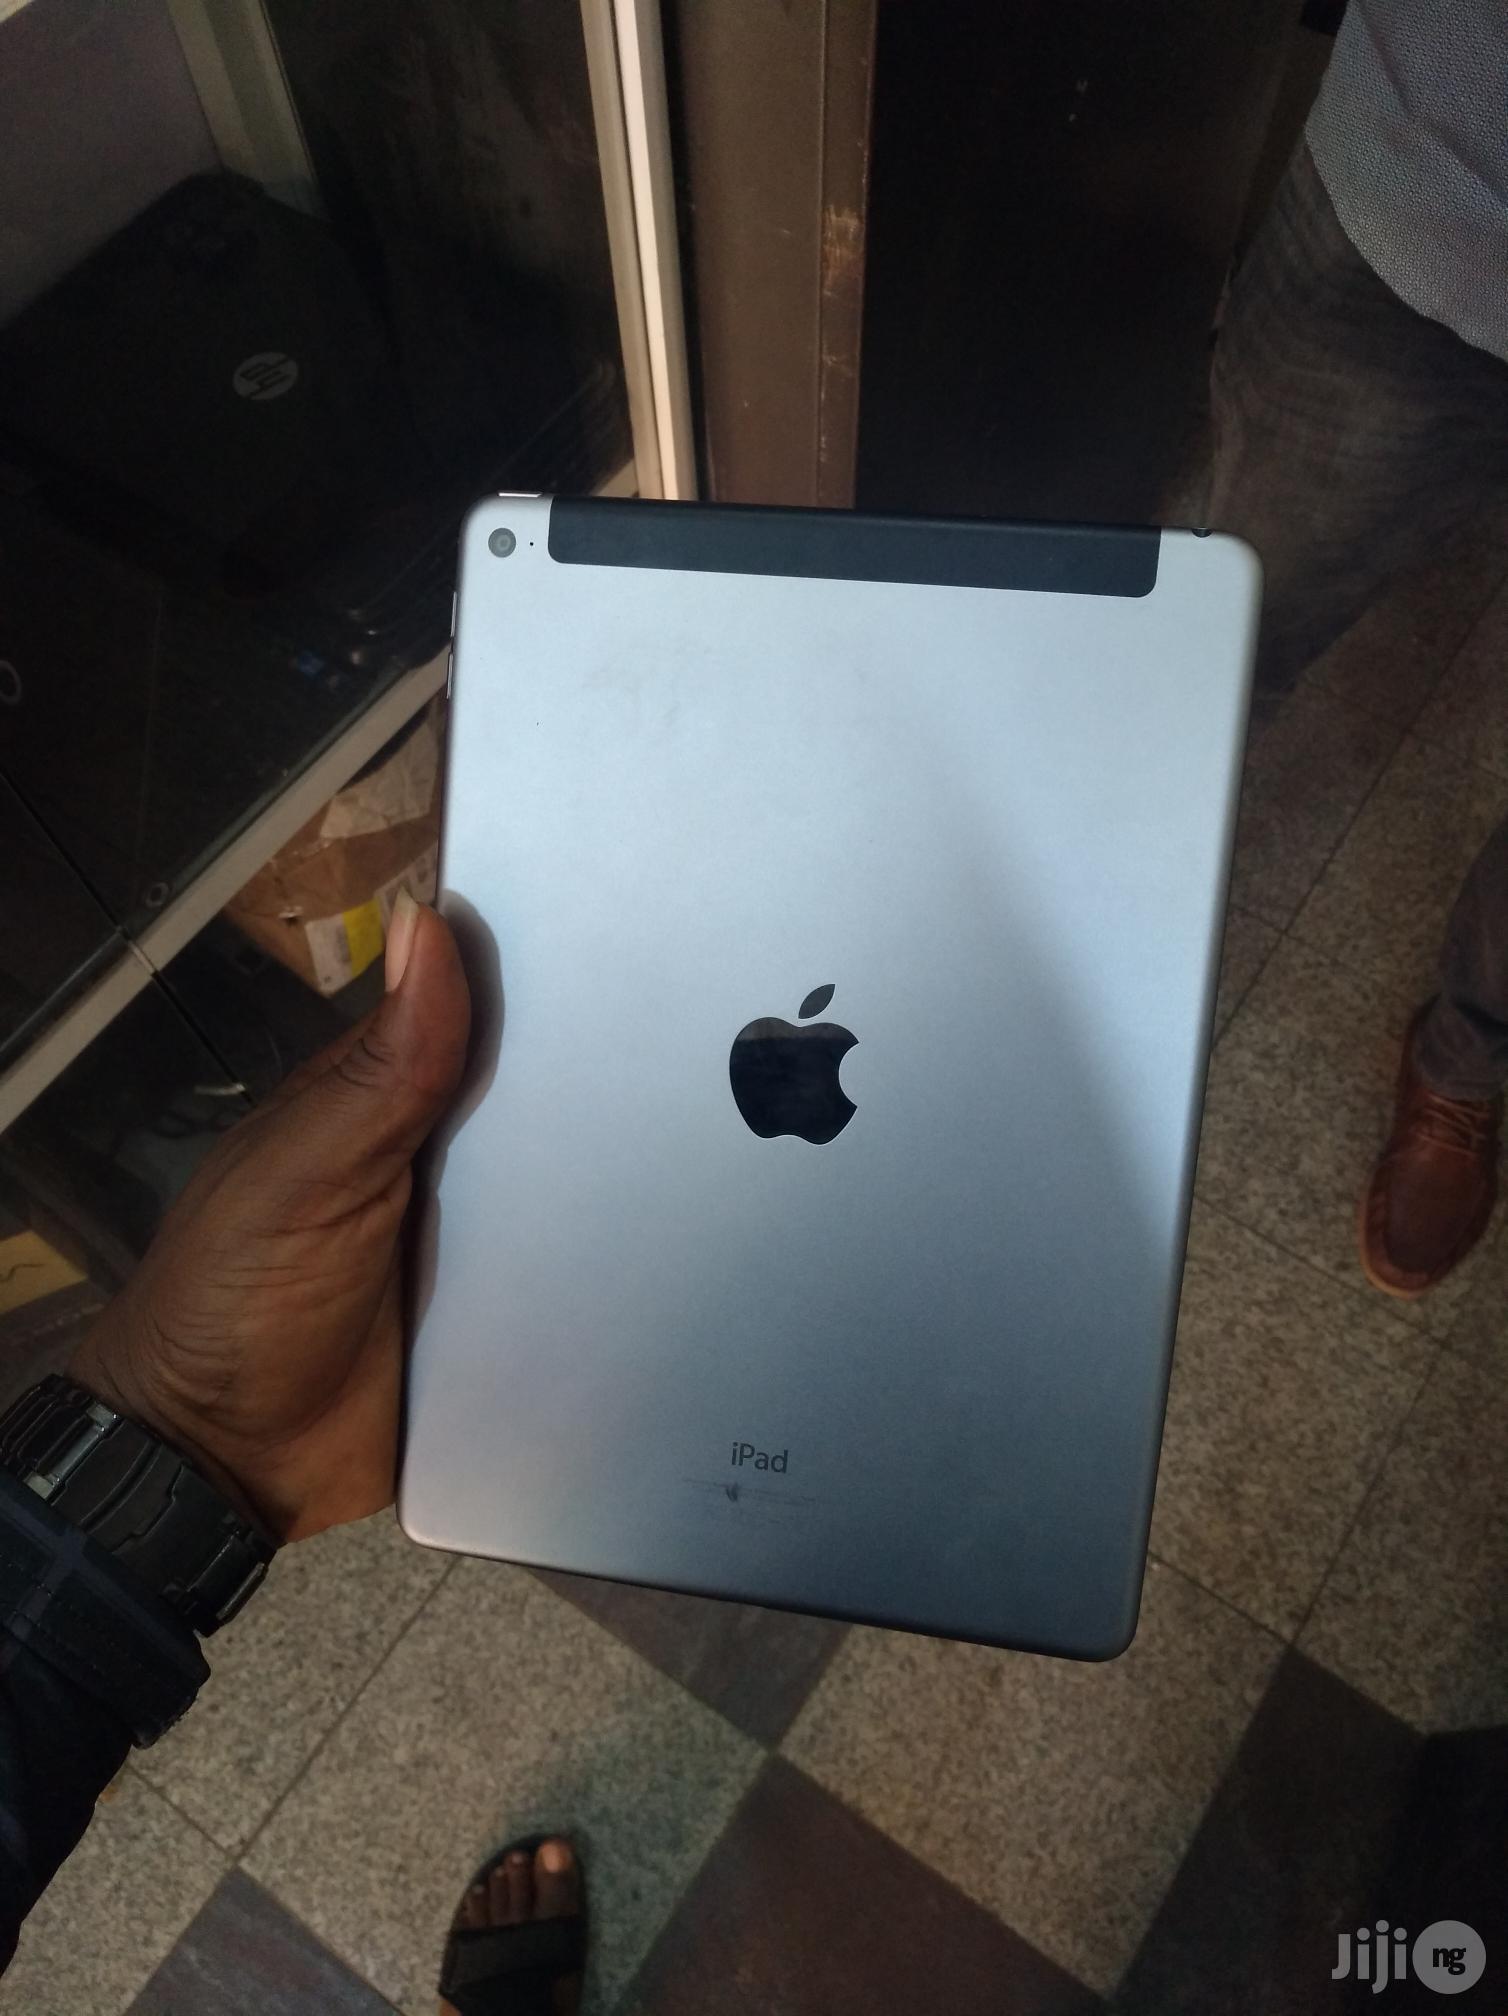 Apple iPad Air 2 64 GB | Tablets for sale in Ikeja, Lagos State, Nigeria